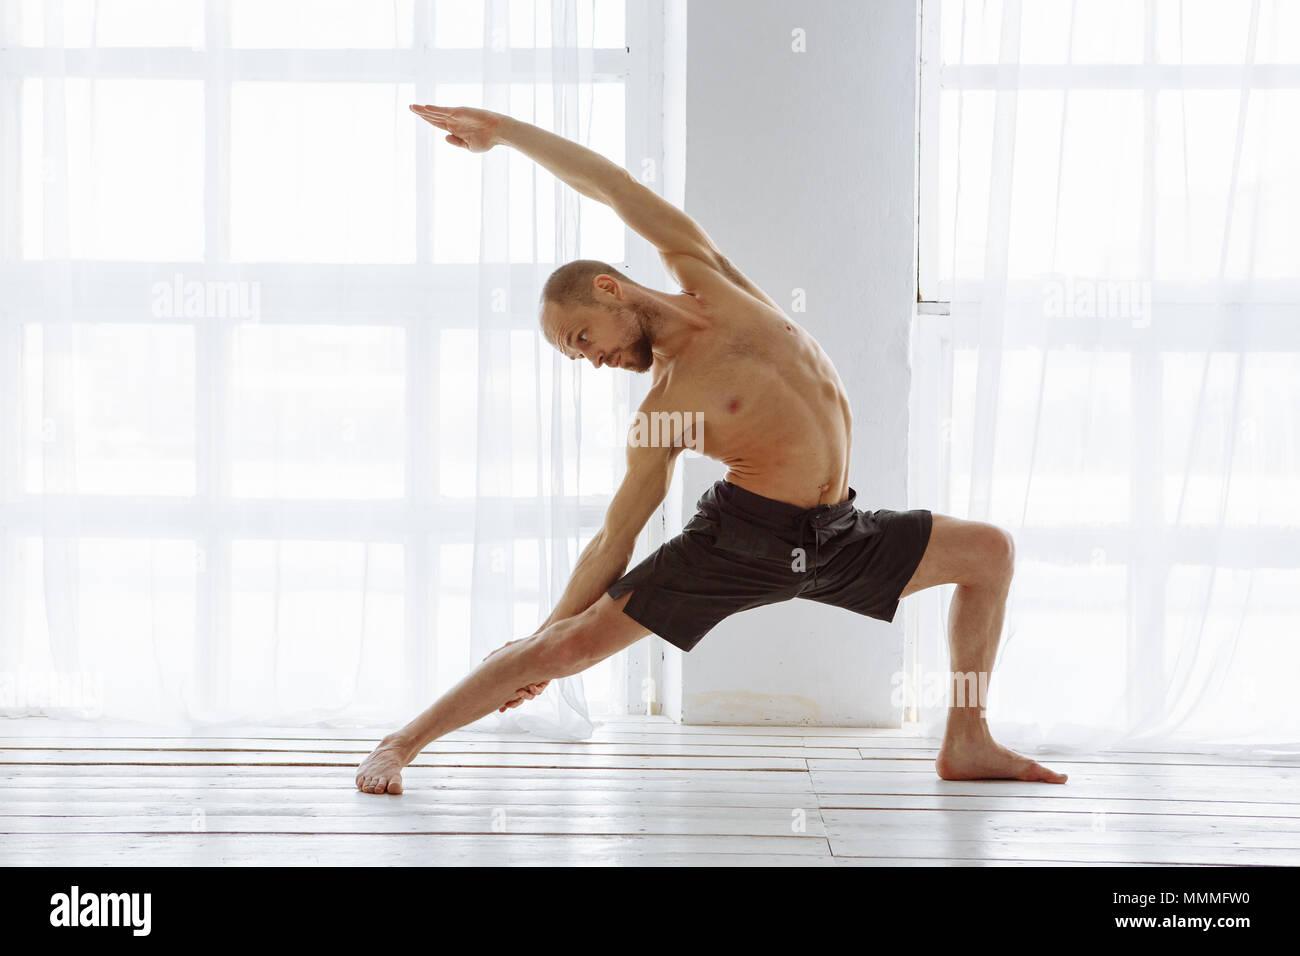 Advanced Yoga Stock Photos & Advanced Yoga Stock Images - Alamy